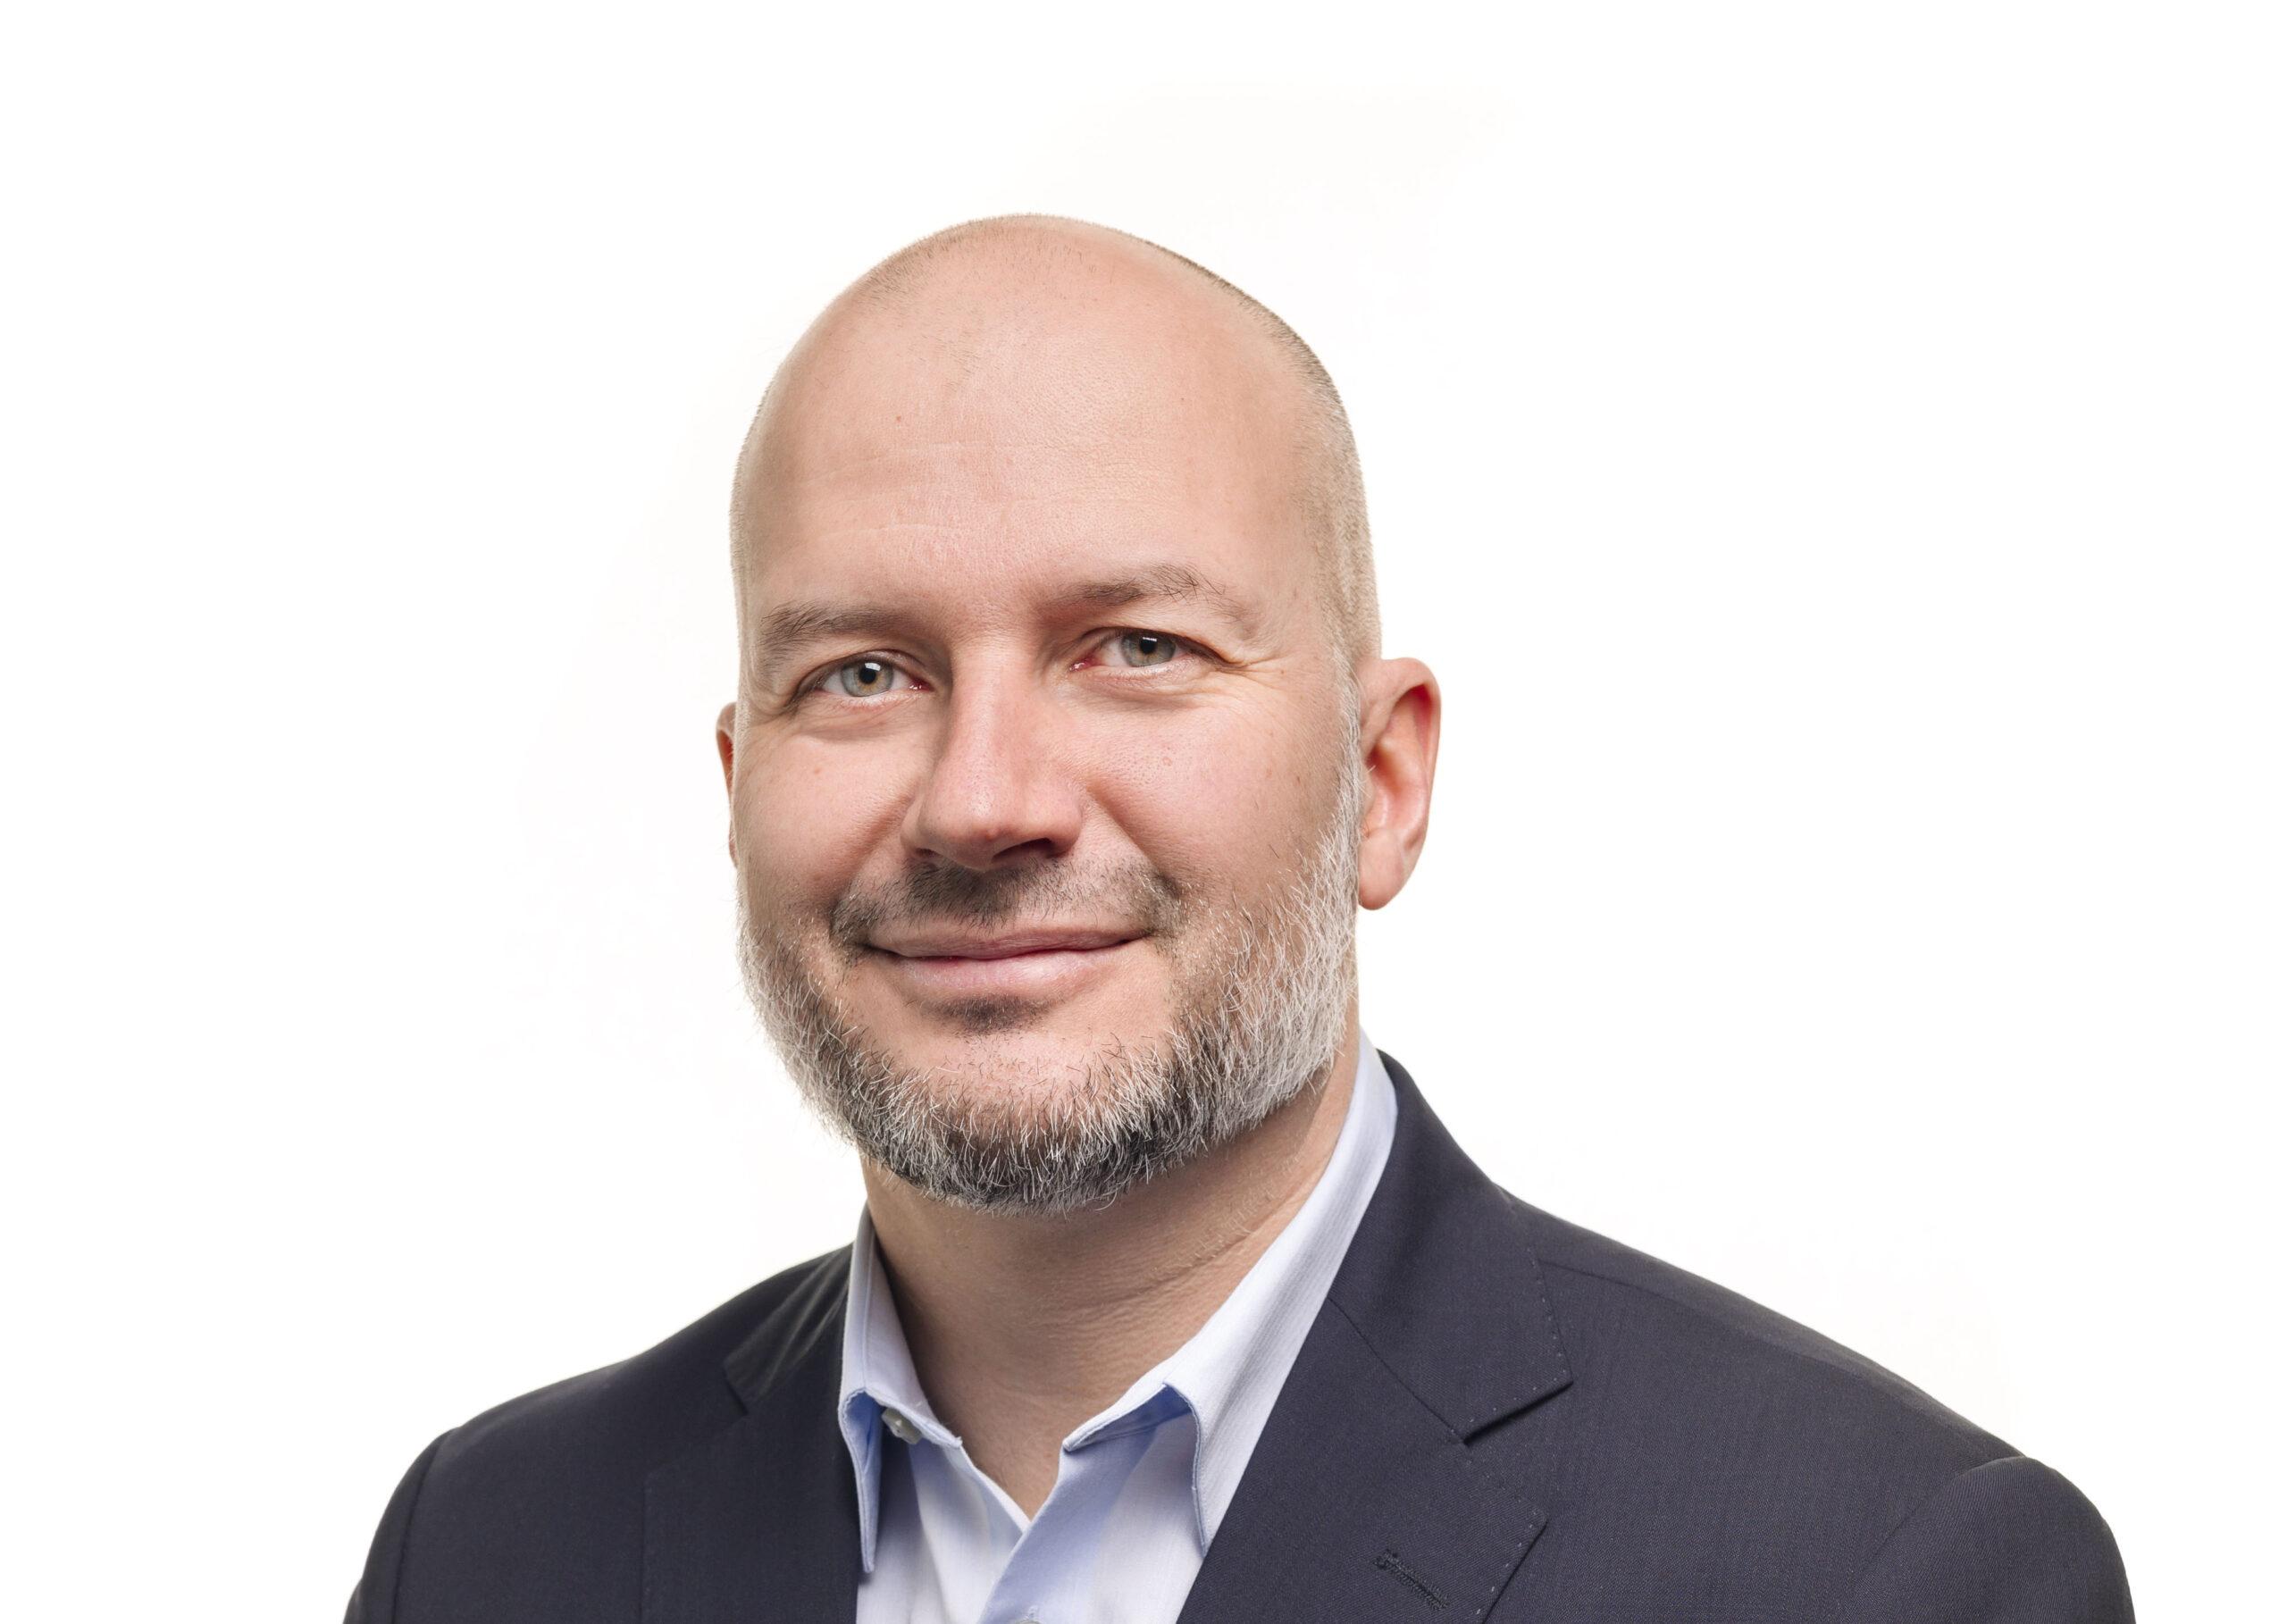 Samu Konttinen appointed CEO of Viria Group